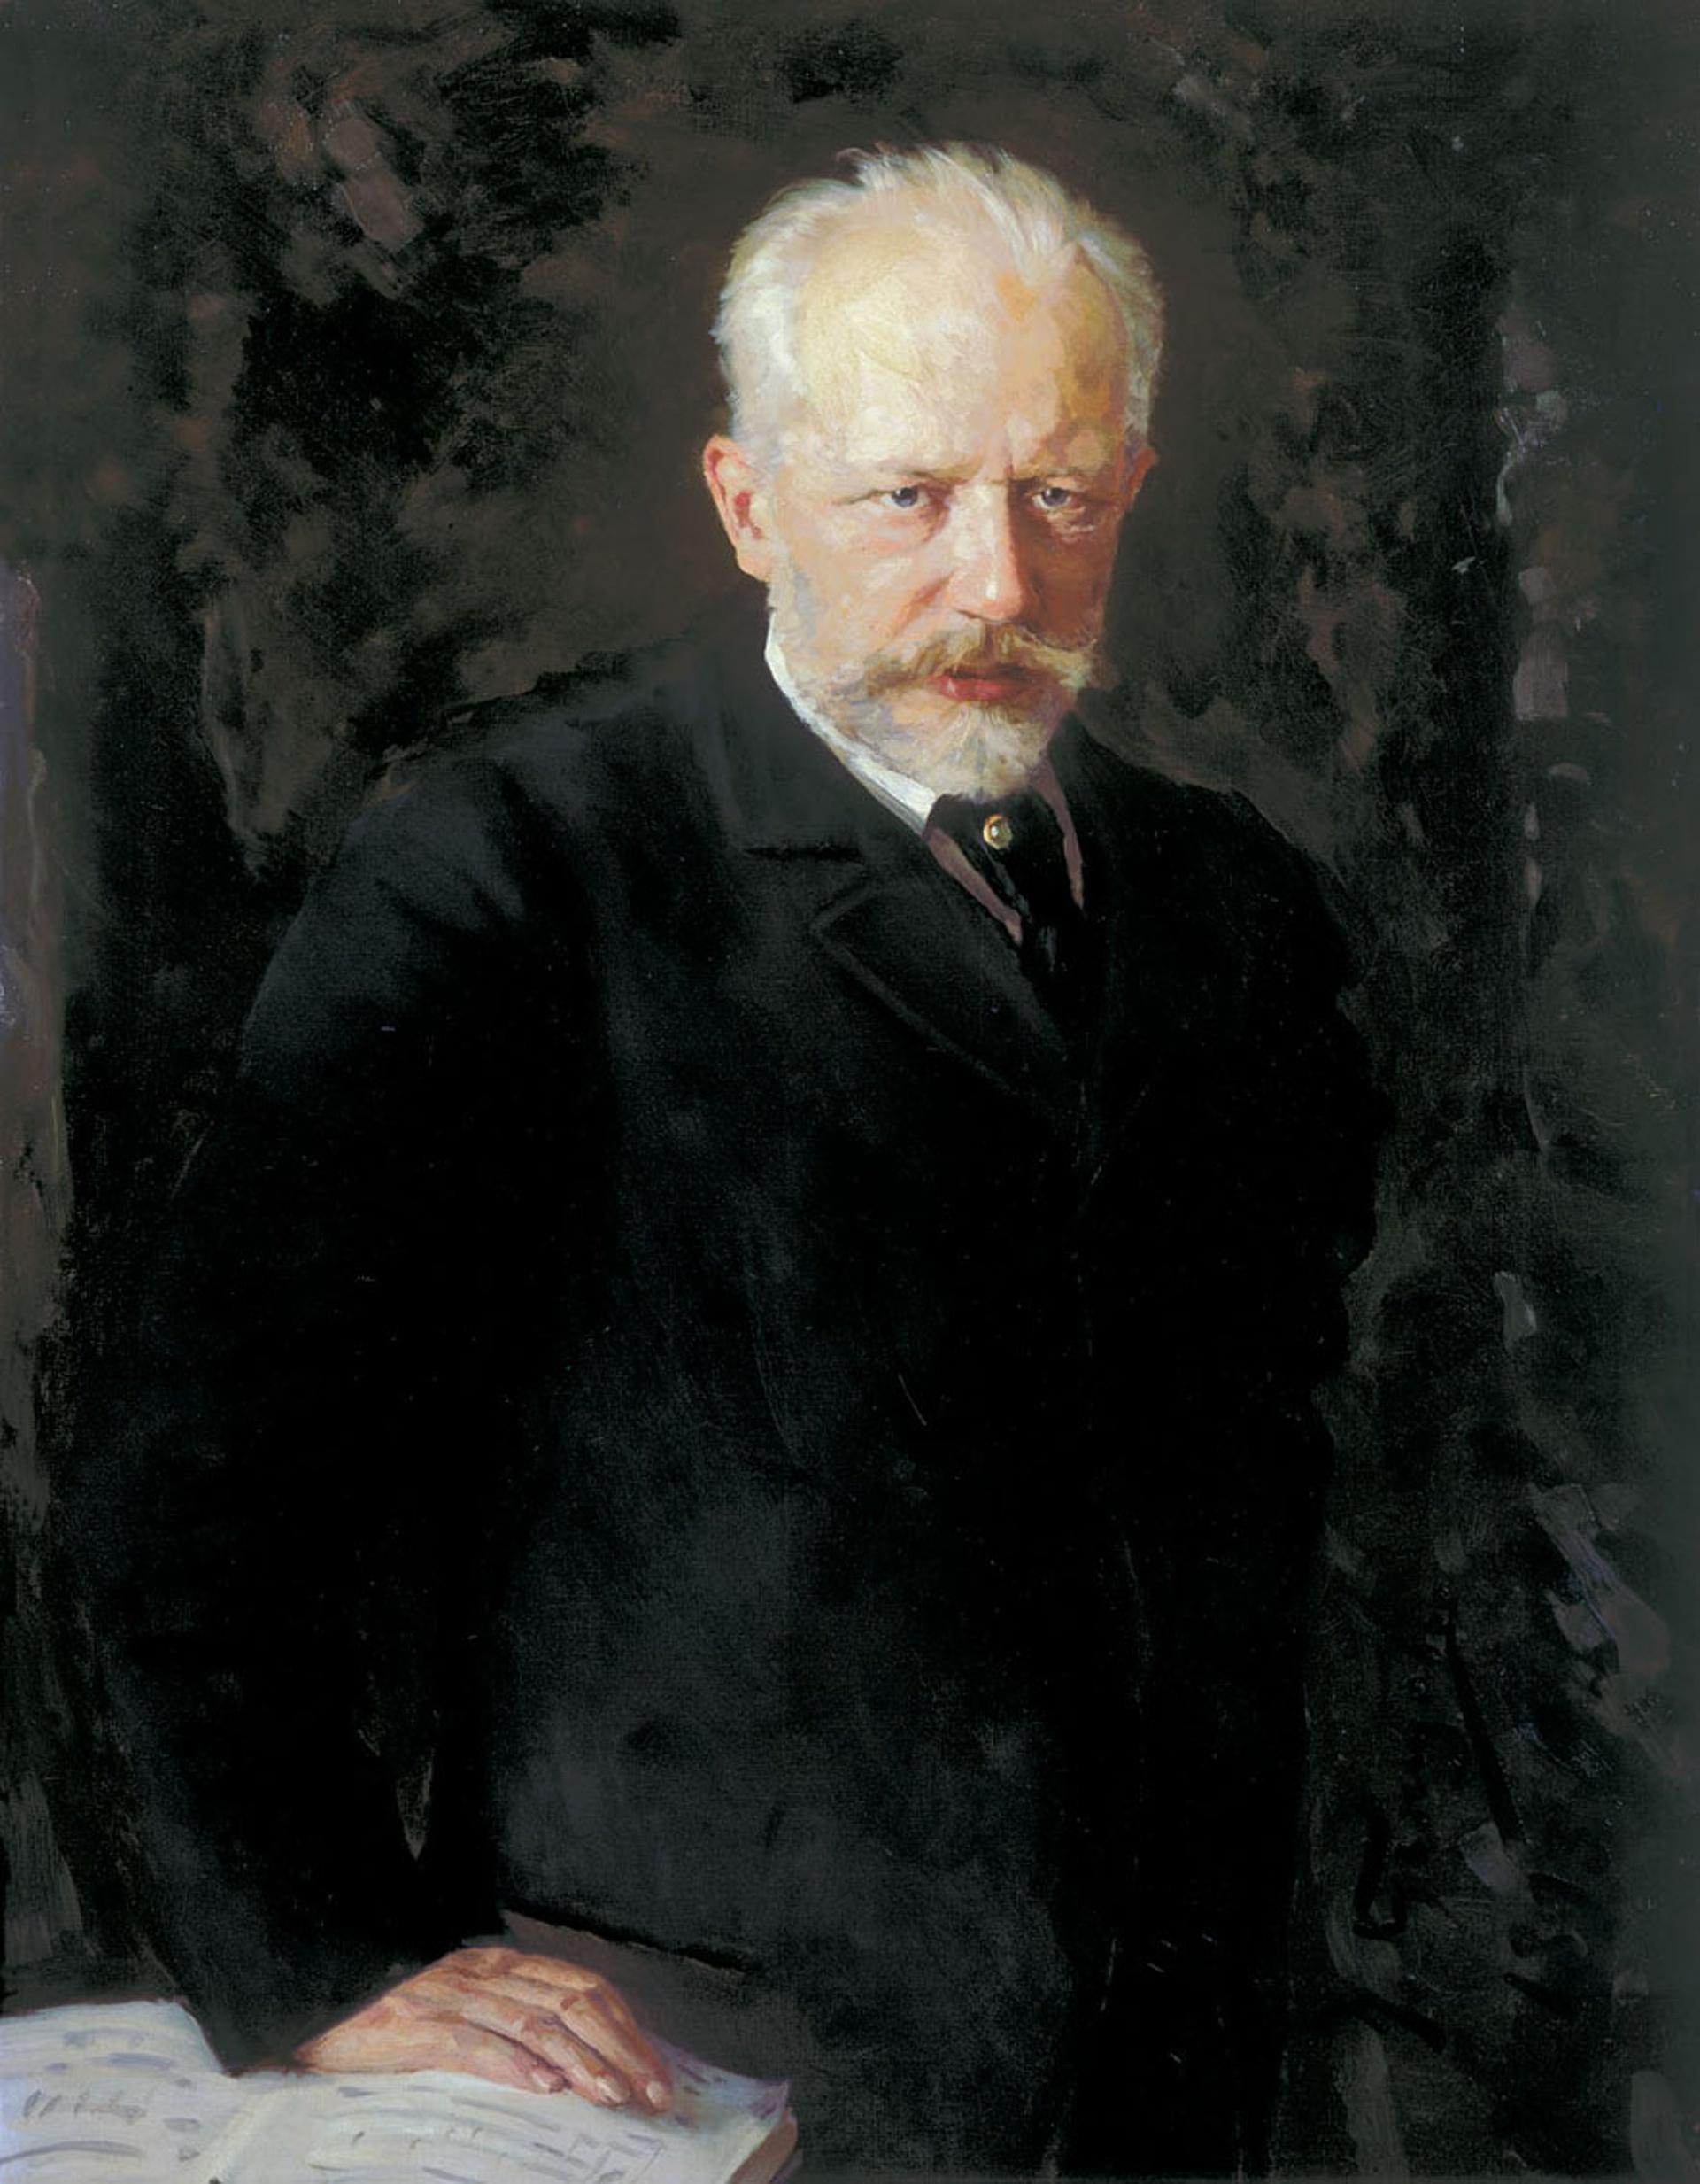 Pjotr Iljitsch Tschaikowski – Wikipedia